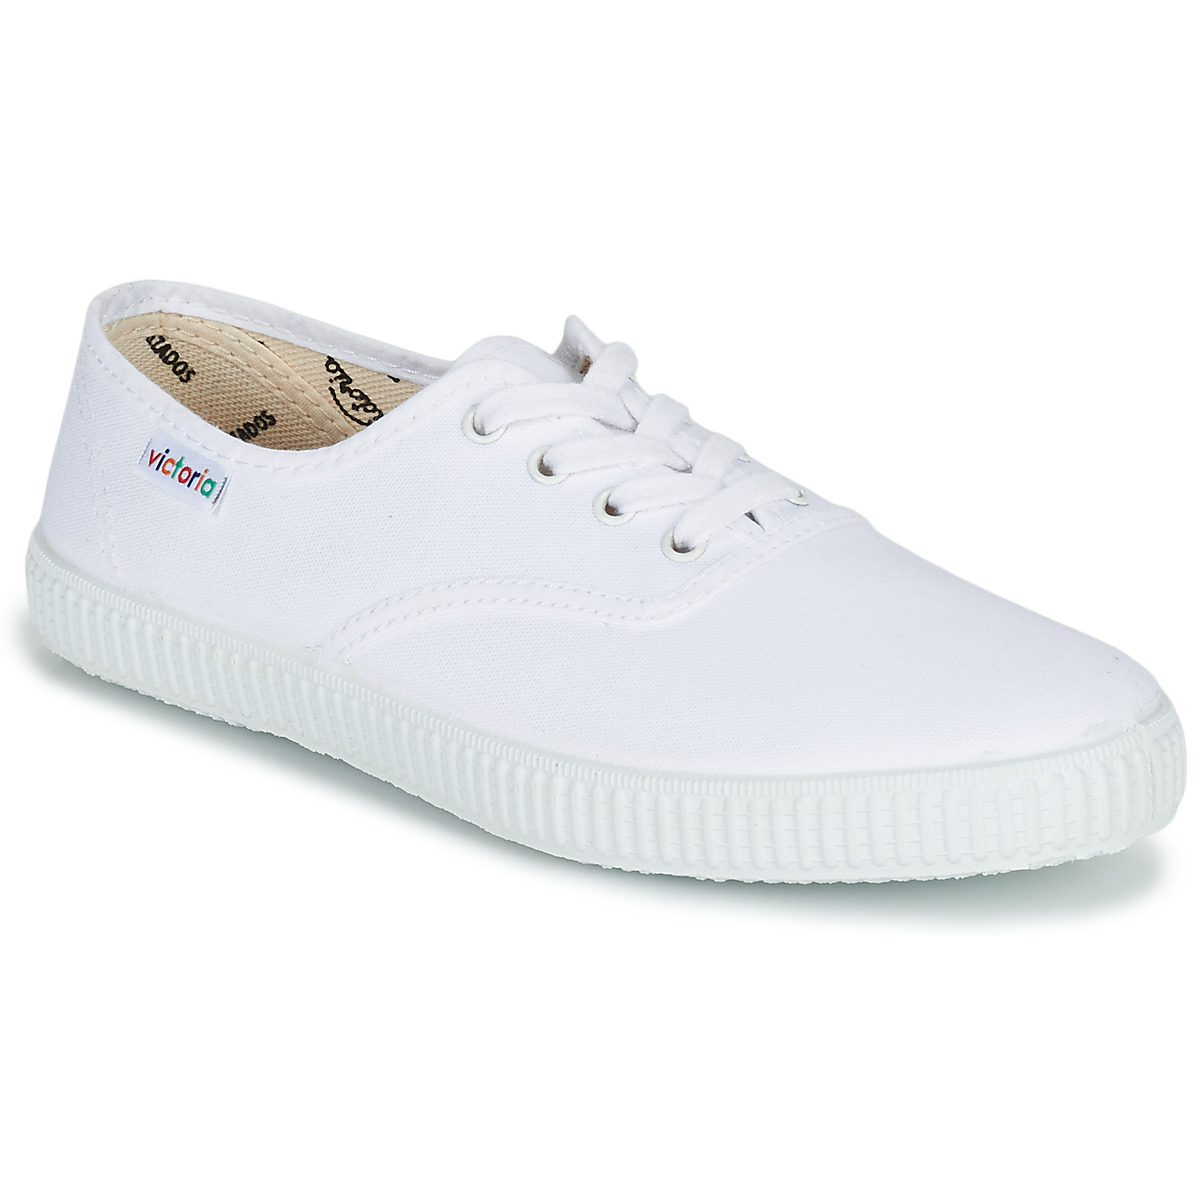 Lona Gruesa, Baskets Basses Femme, Blanc (Blanco), 41 EUVictoria